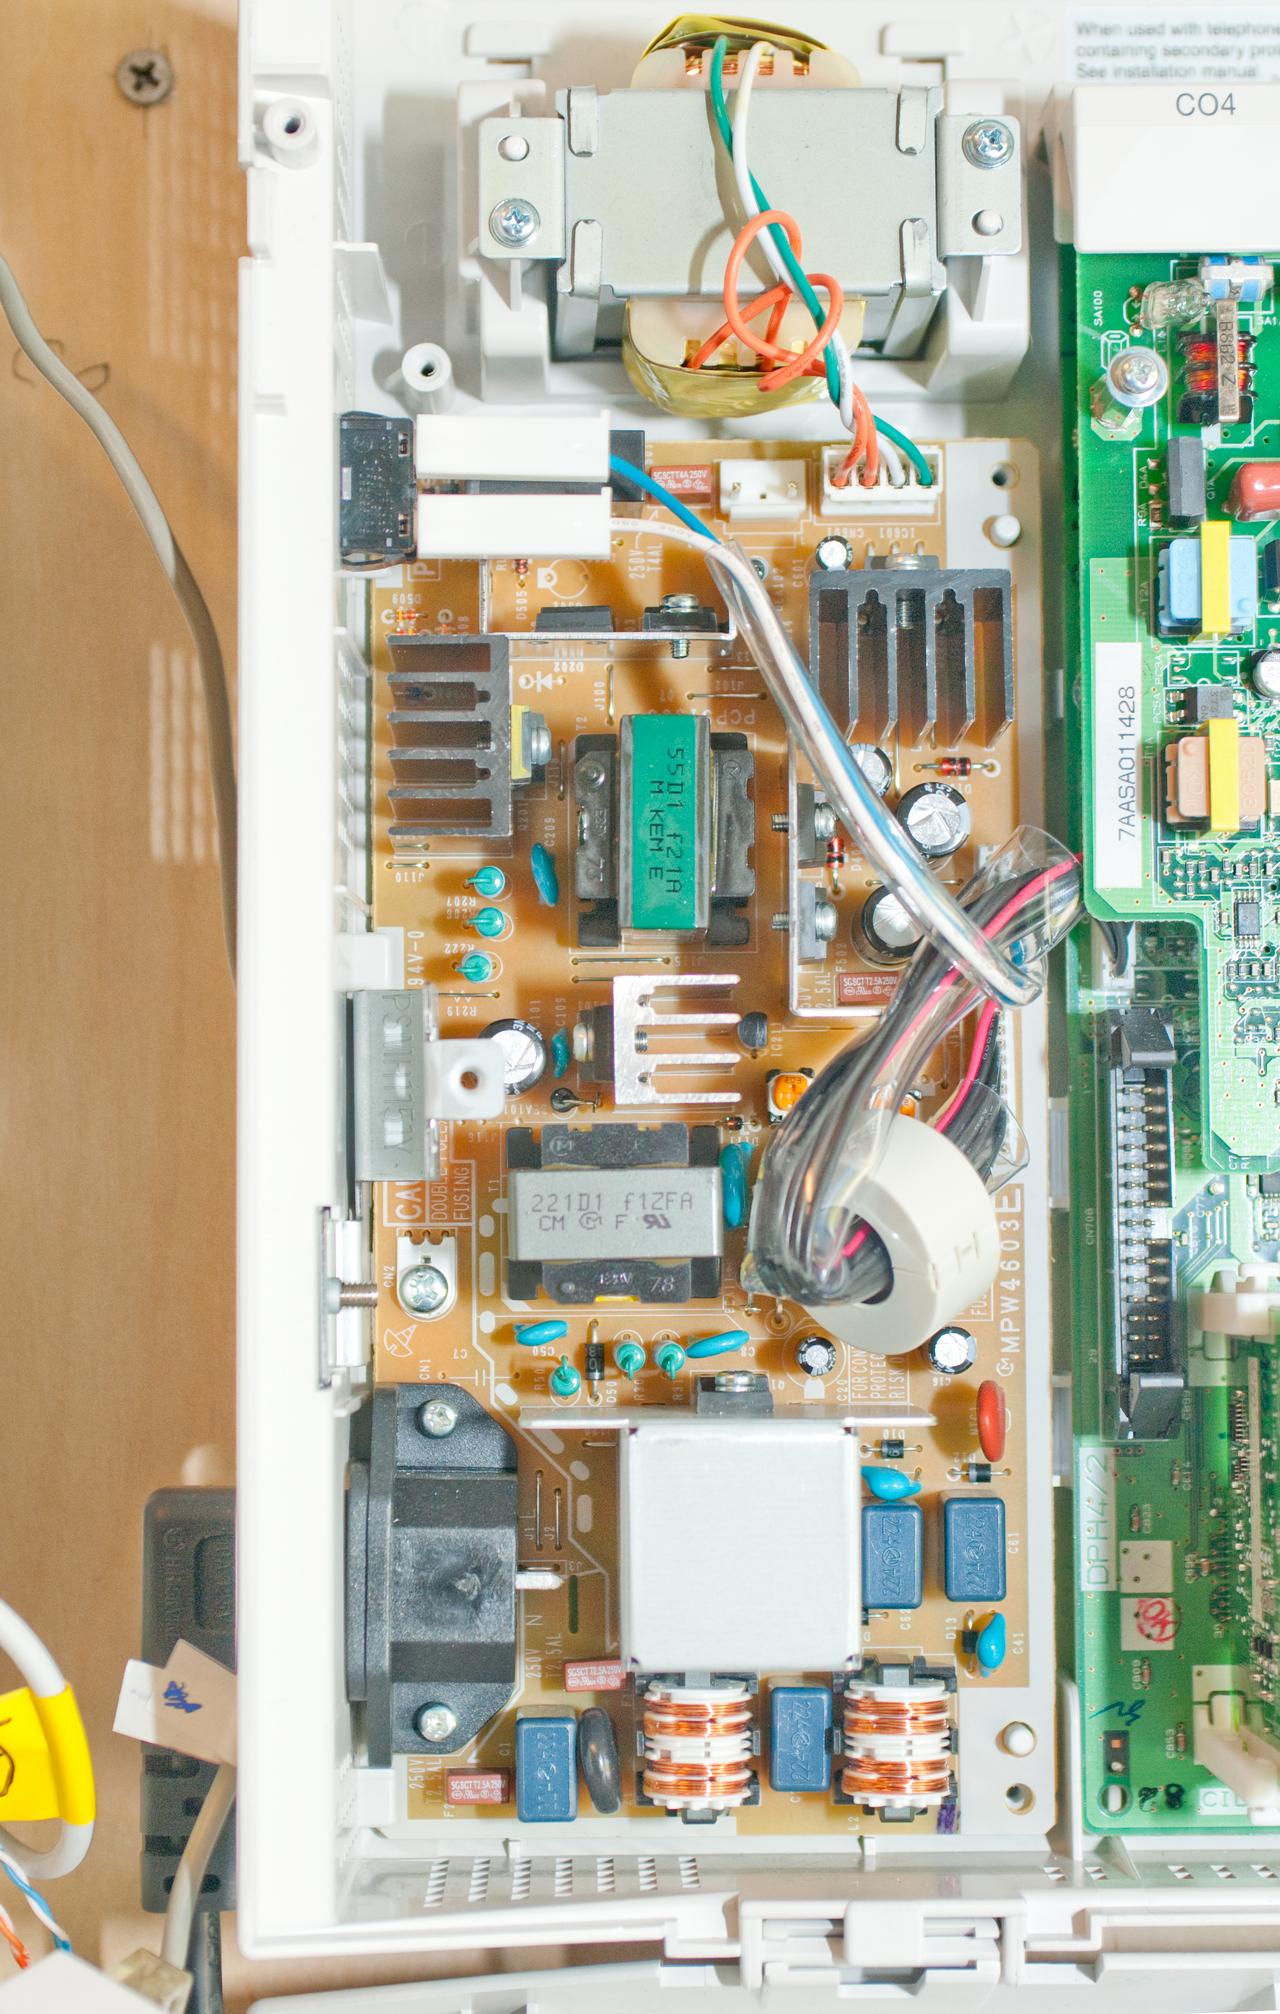 Panasonic Kx Ta824 Telephone System Telephoneringer Telephonerelatedcircuit Electricalequipment